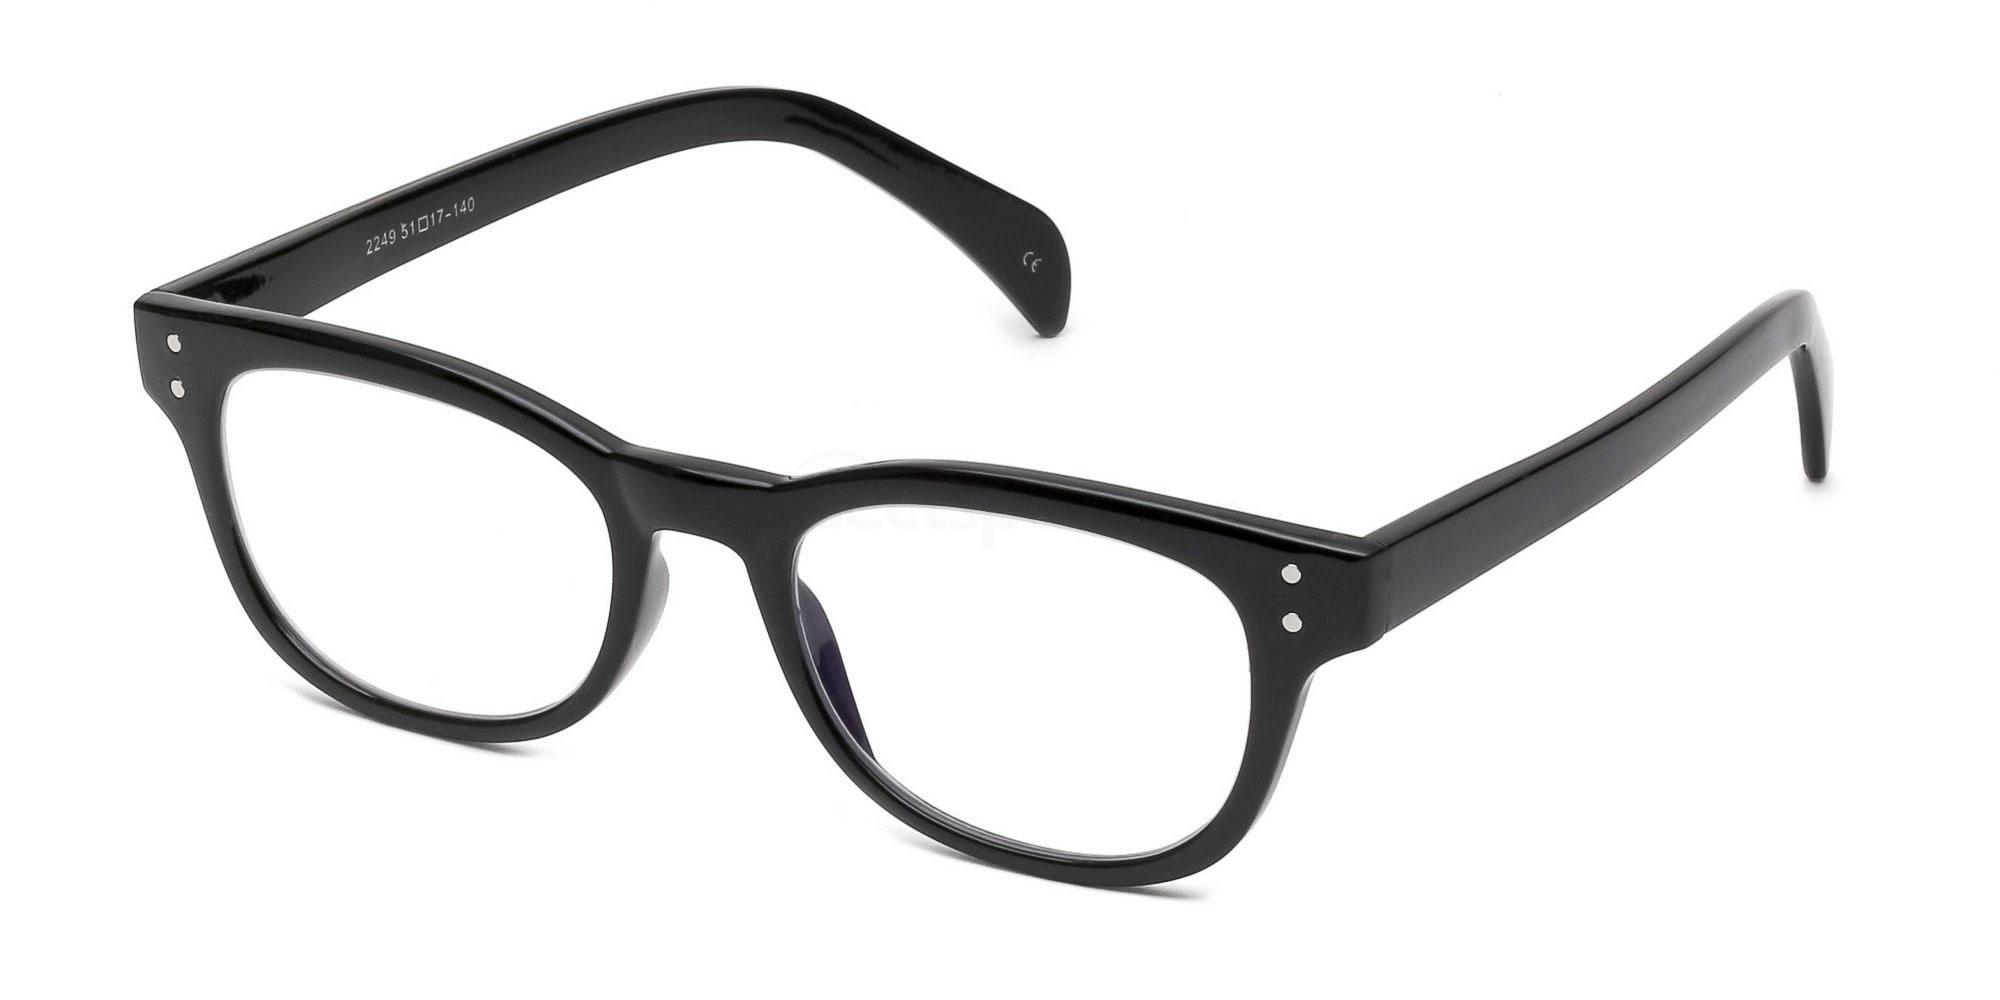 Savannah P2249 Clark Kent glasses